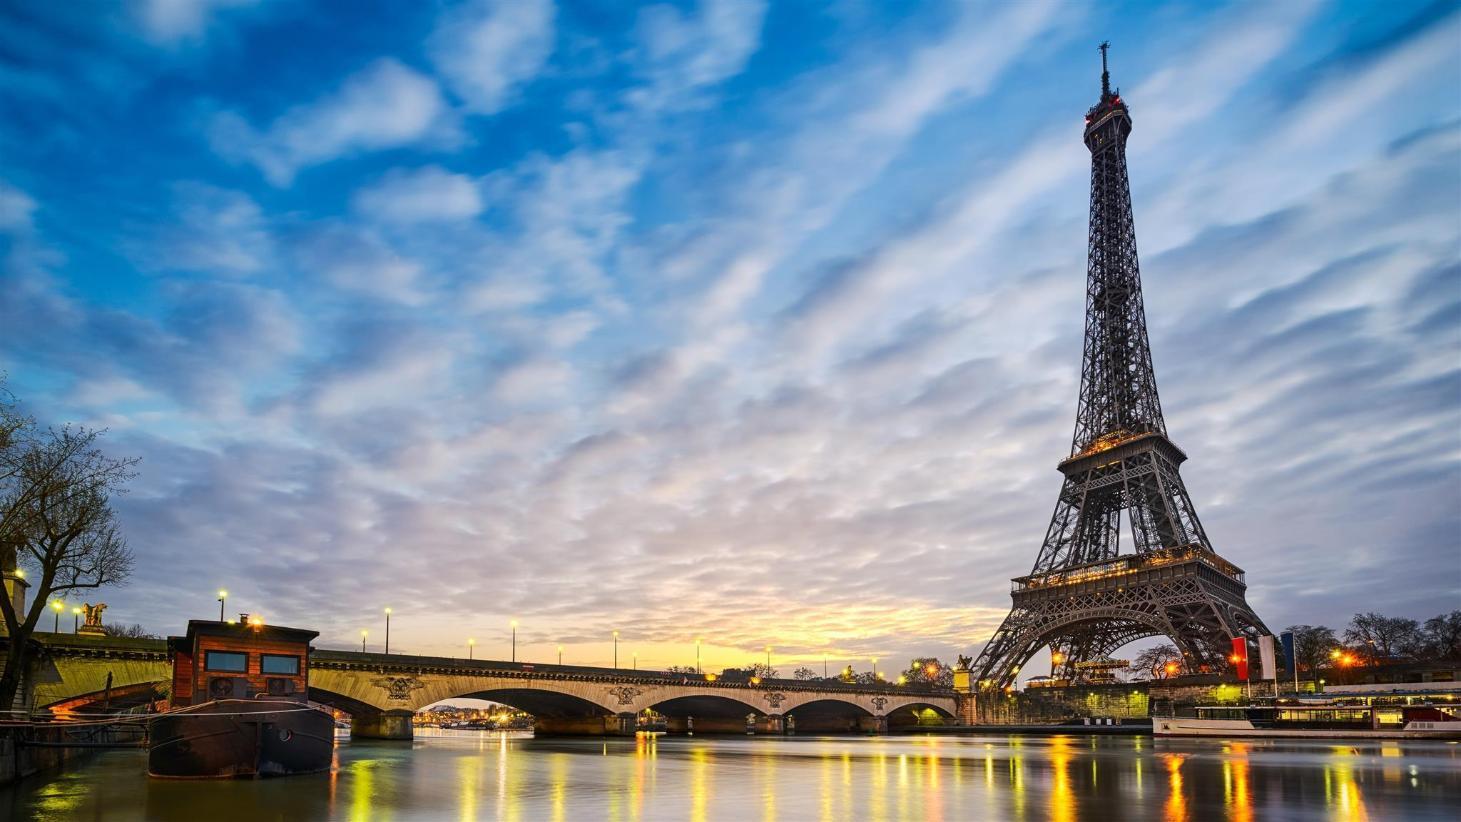 Paris France Street Map, Find Hotels In Paris France, Paris France Street Map